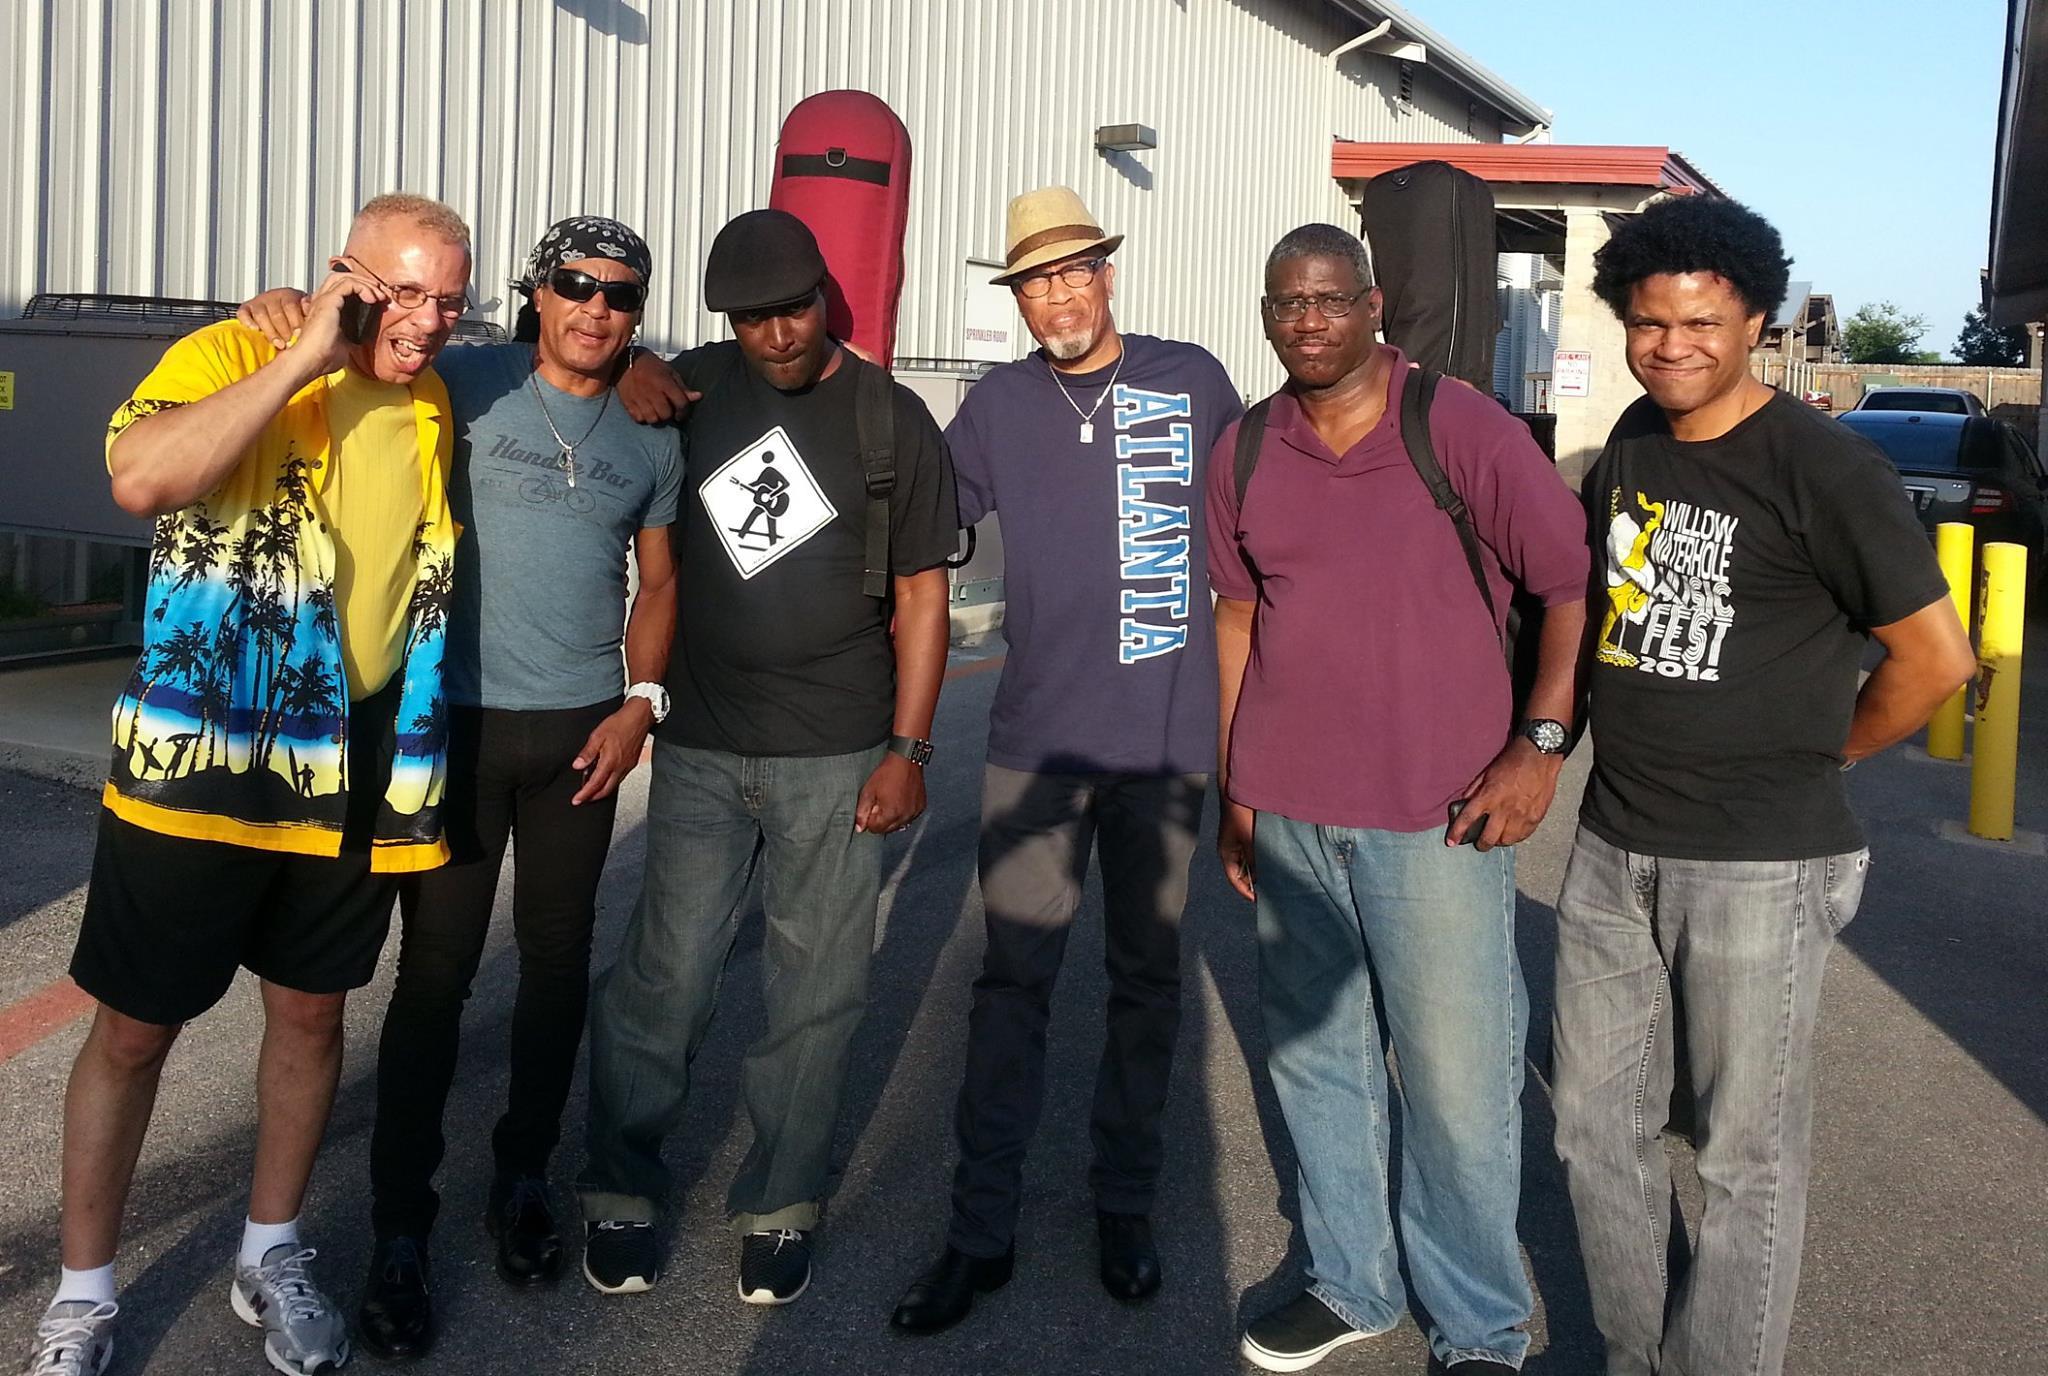 San Antonio with the band.